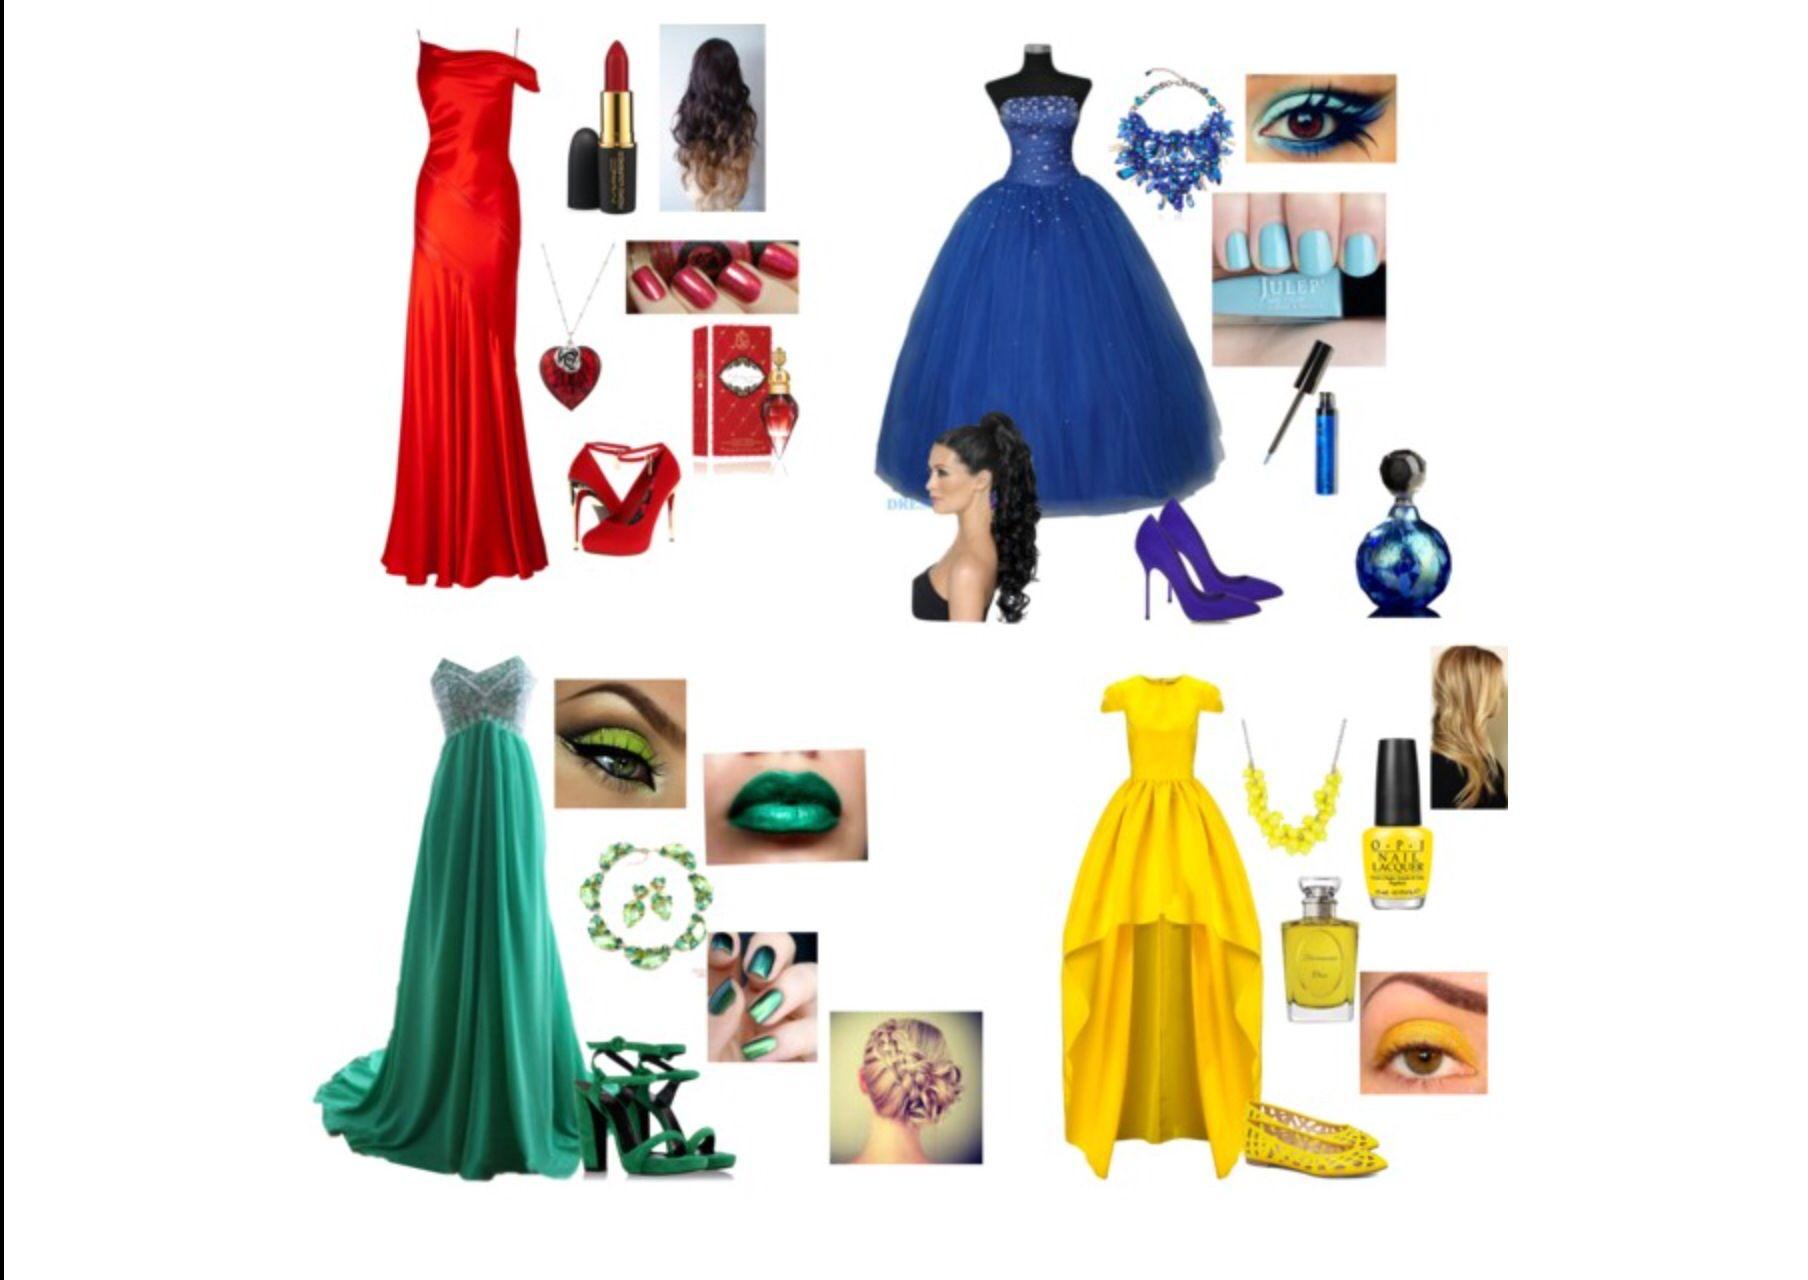 Hogwarts House Prom Dresses F A S H I O N Hogwarts Hogwarts